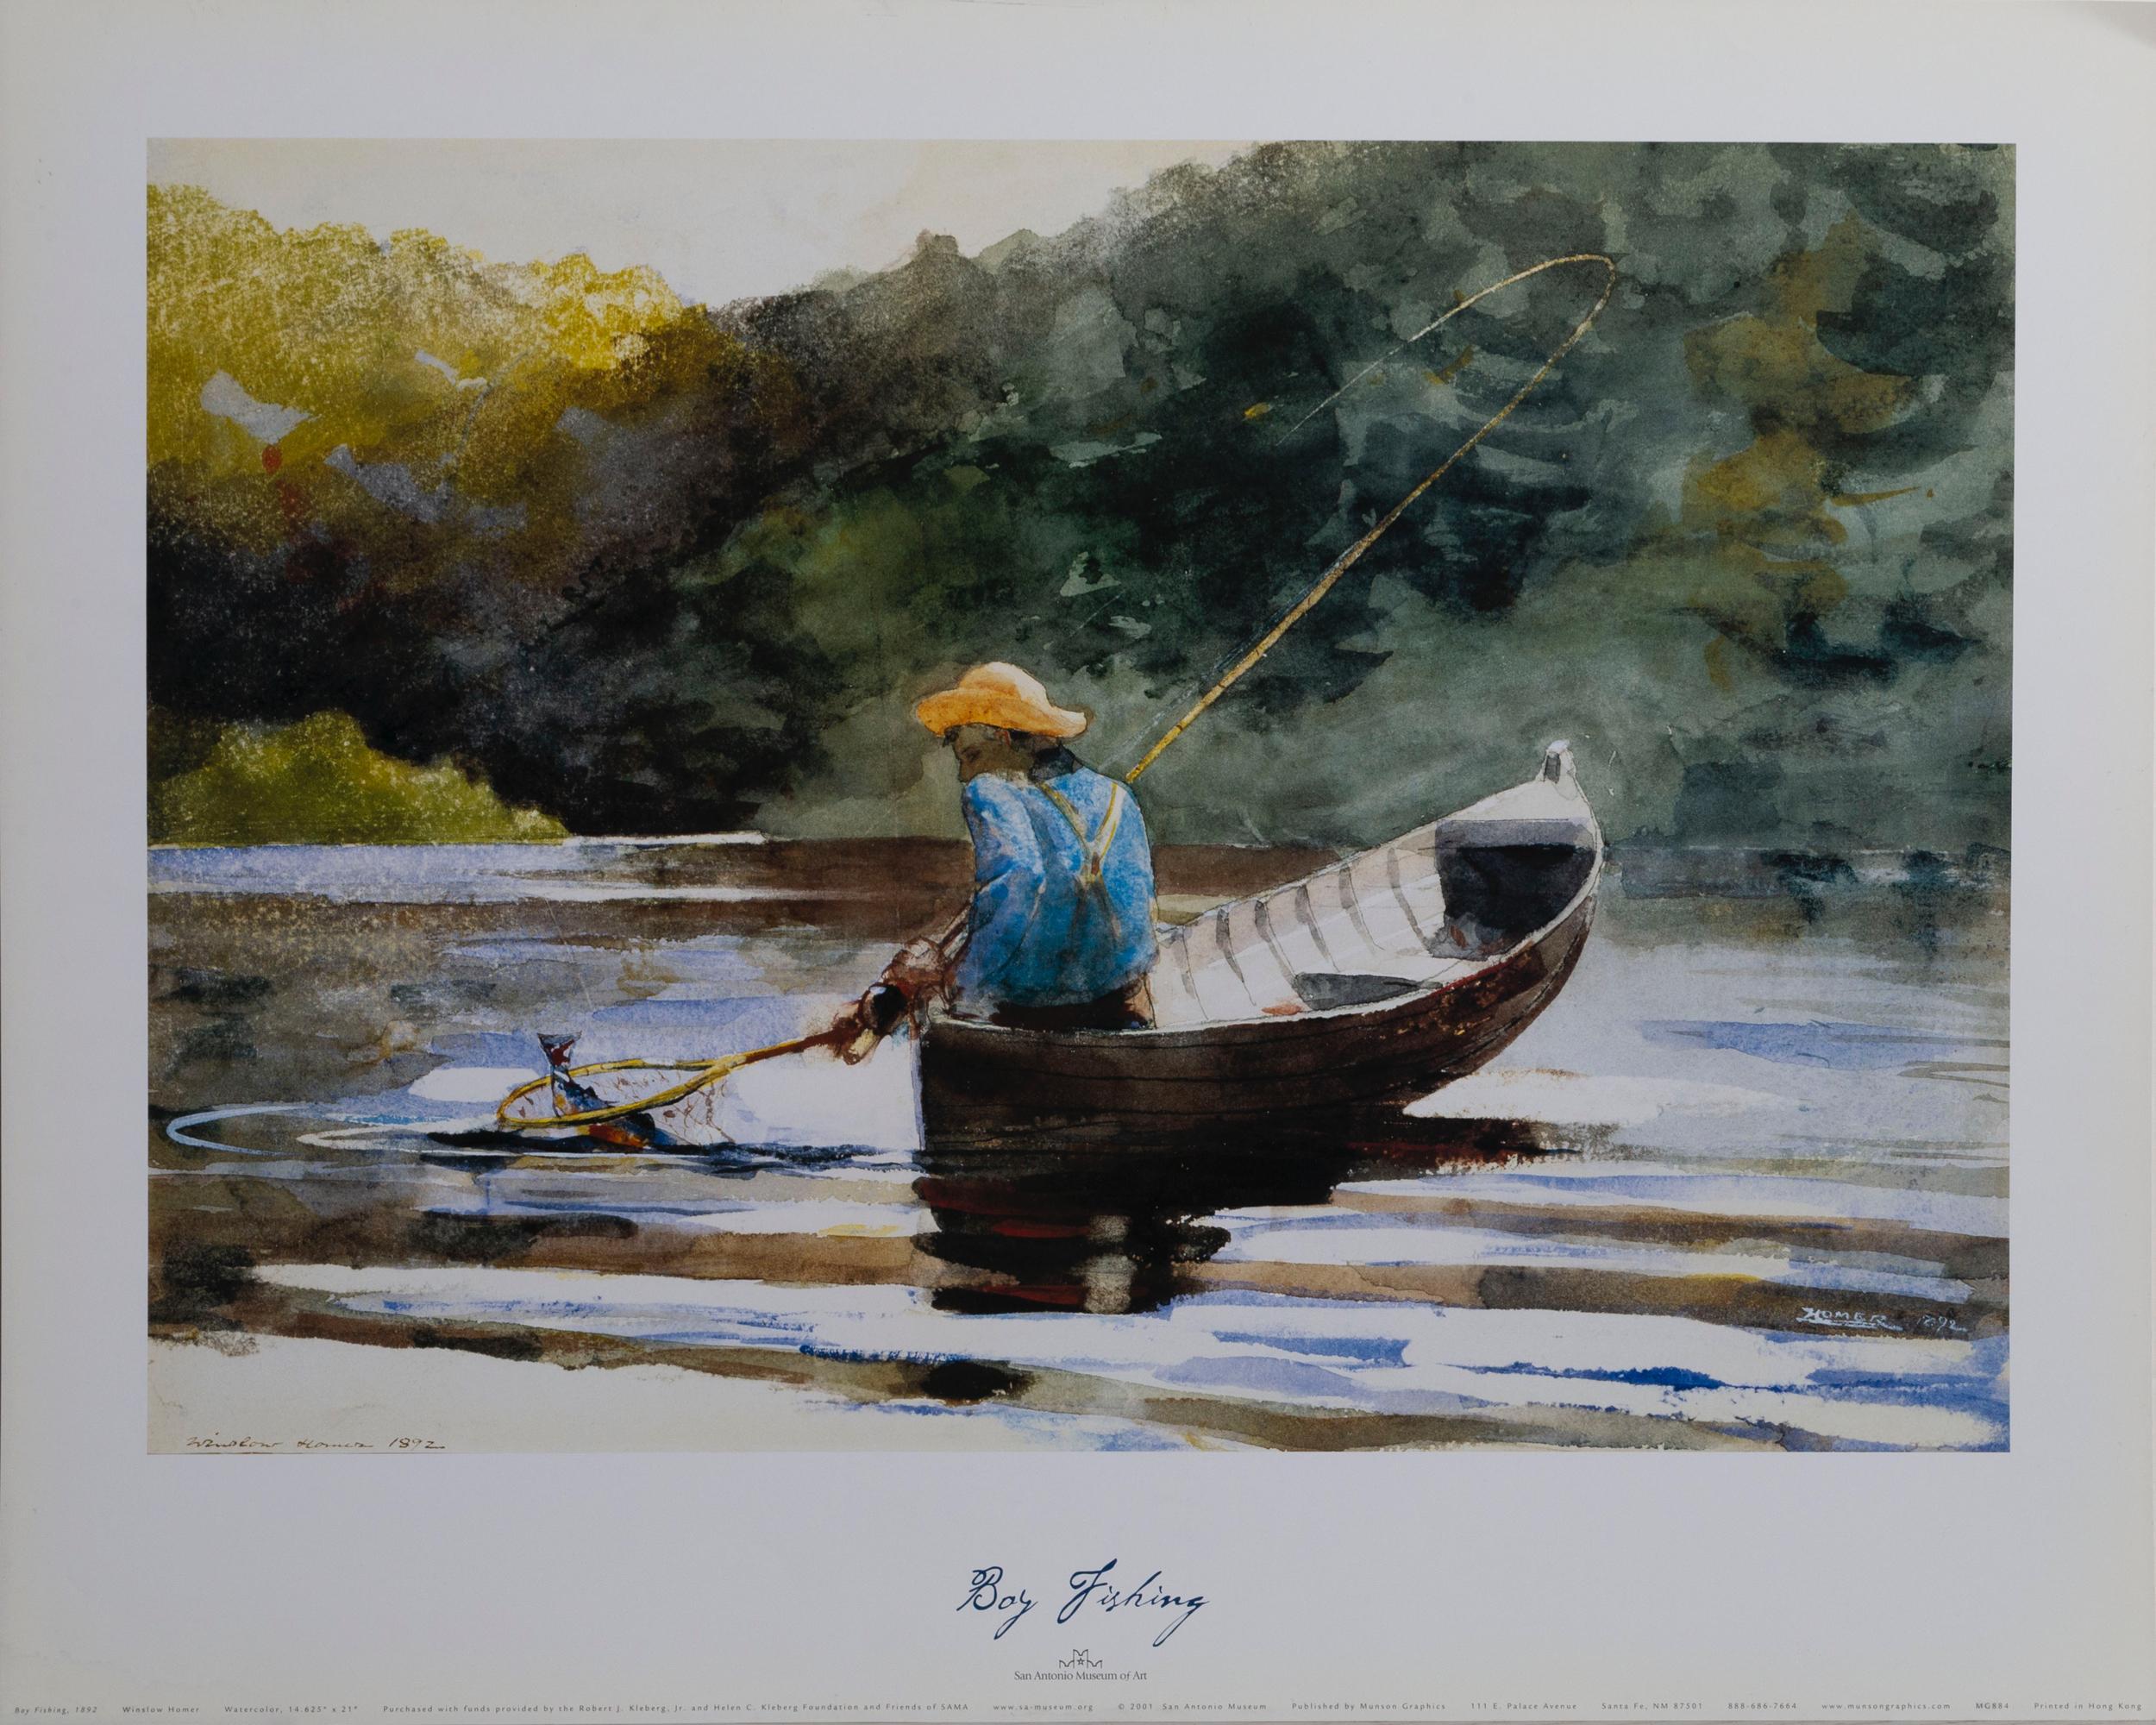 Winslow Homer, Boy Fishing, Poster